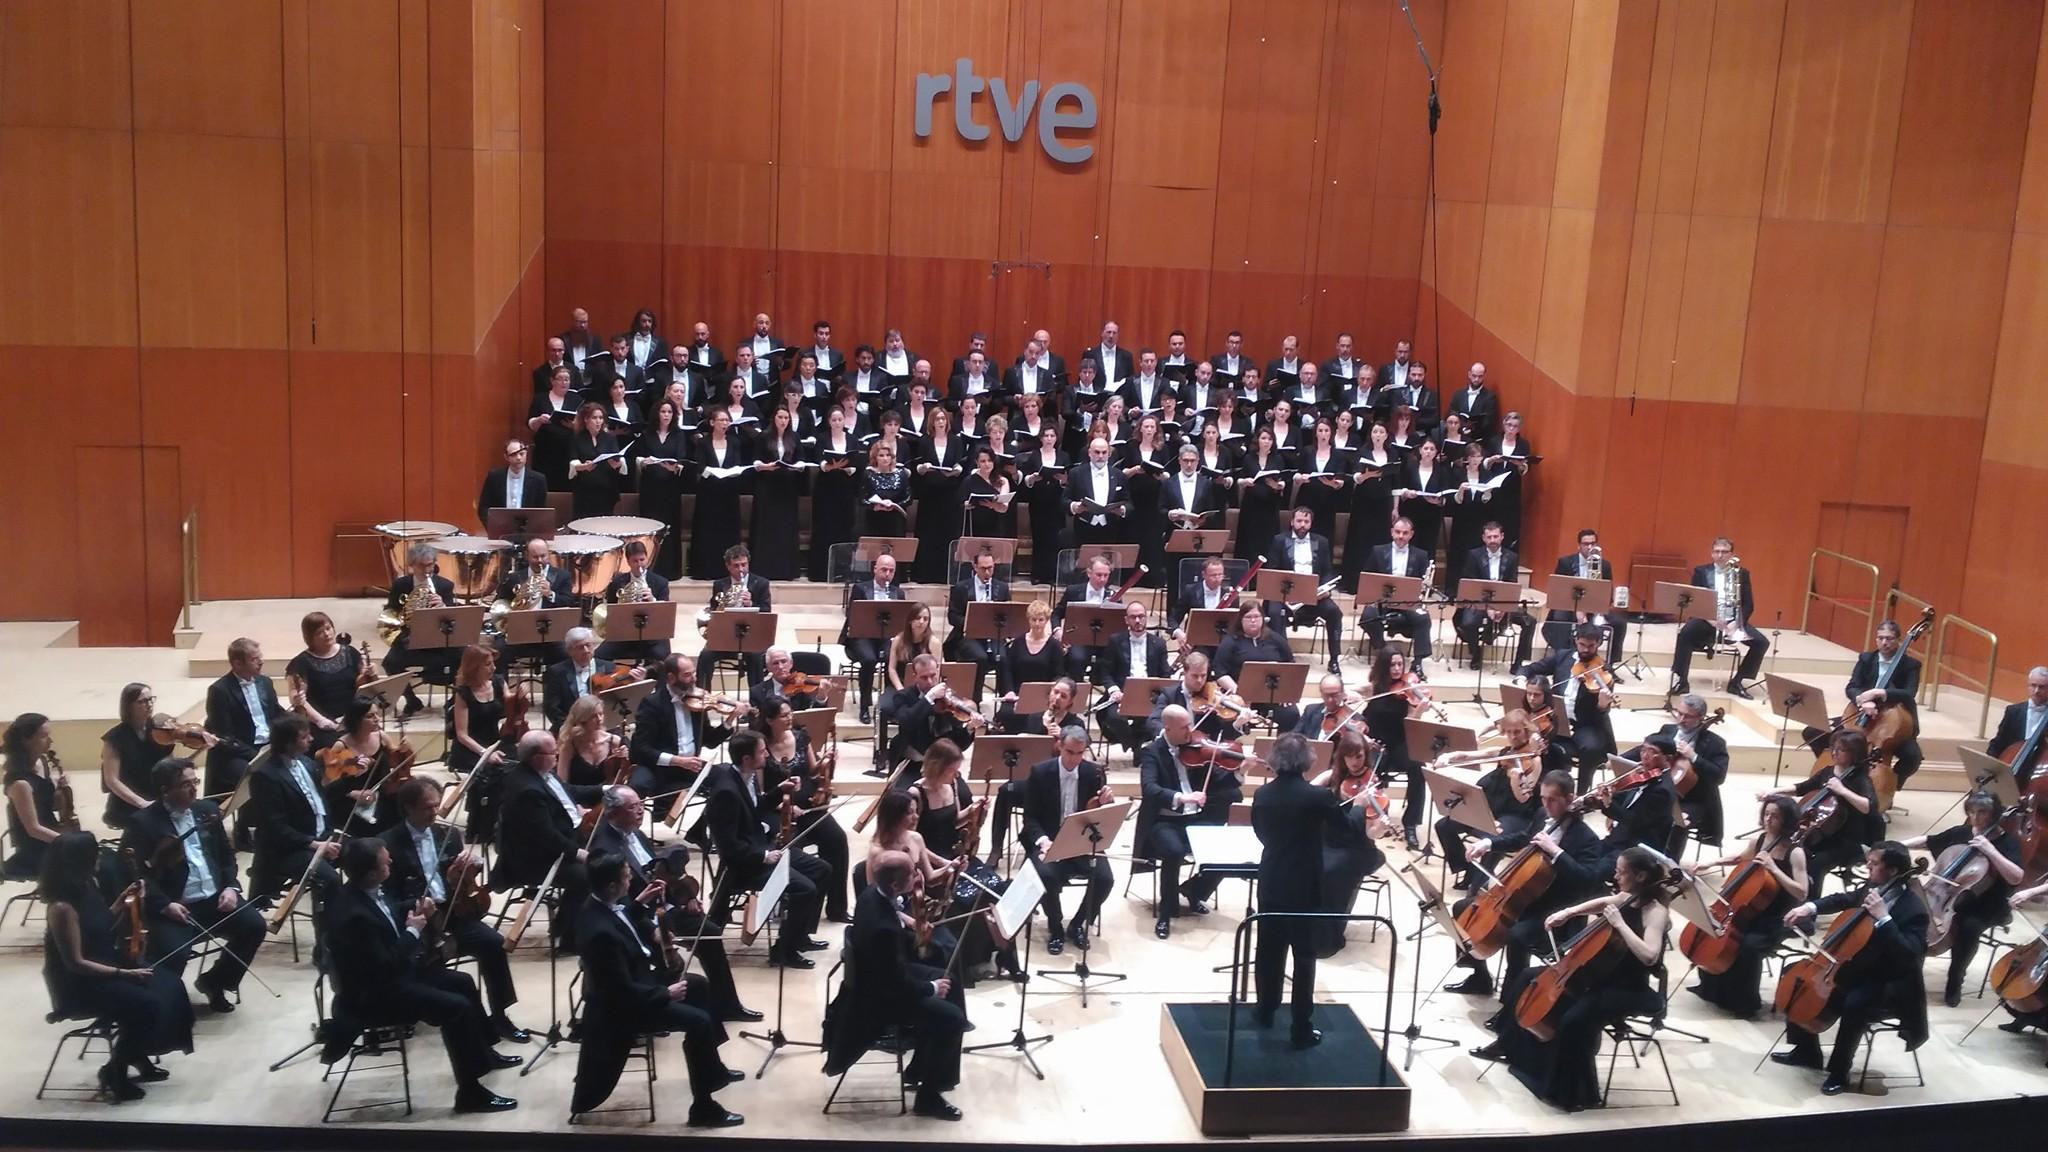 Exitoso Stabat Mater de Rossini con la OCRTVE